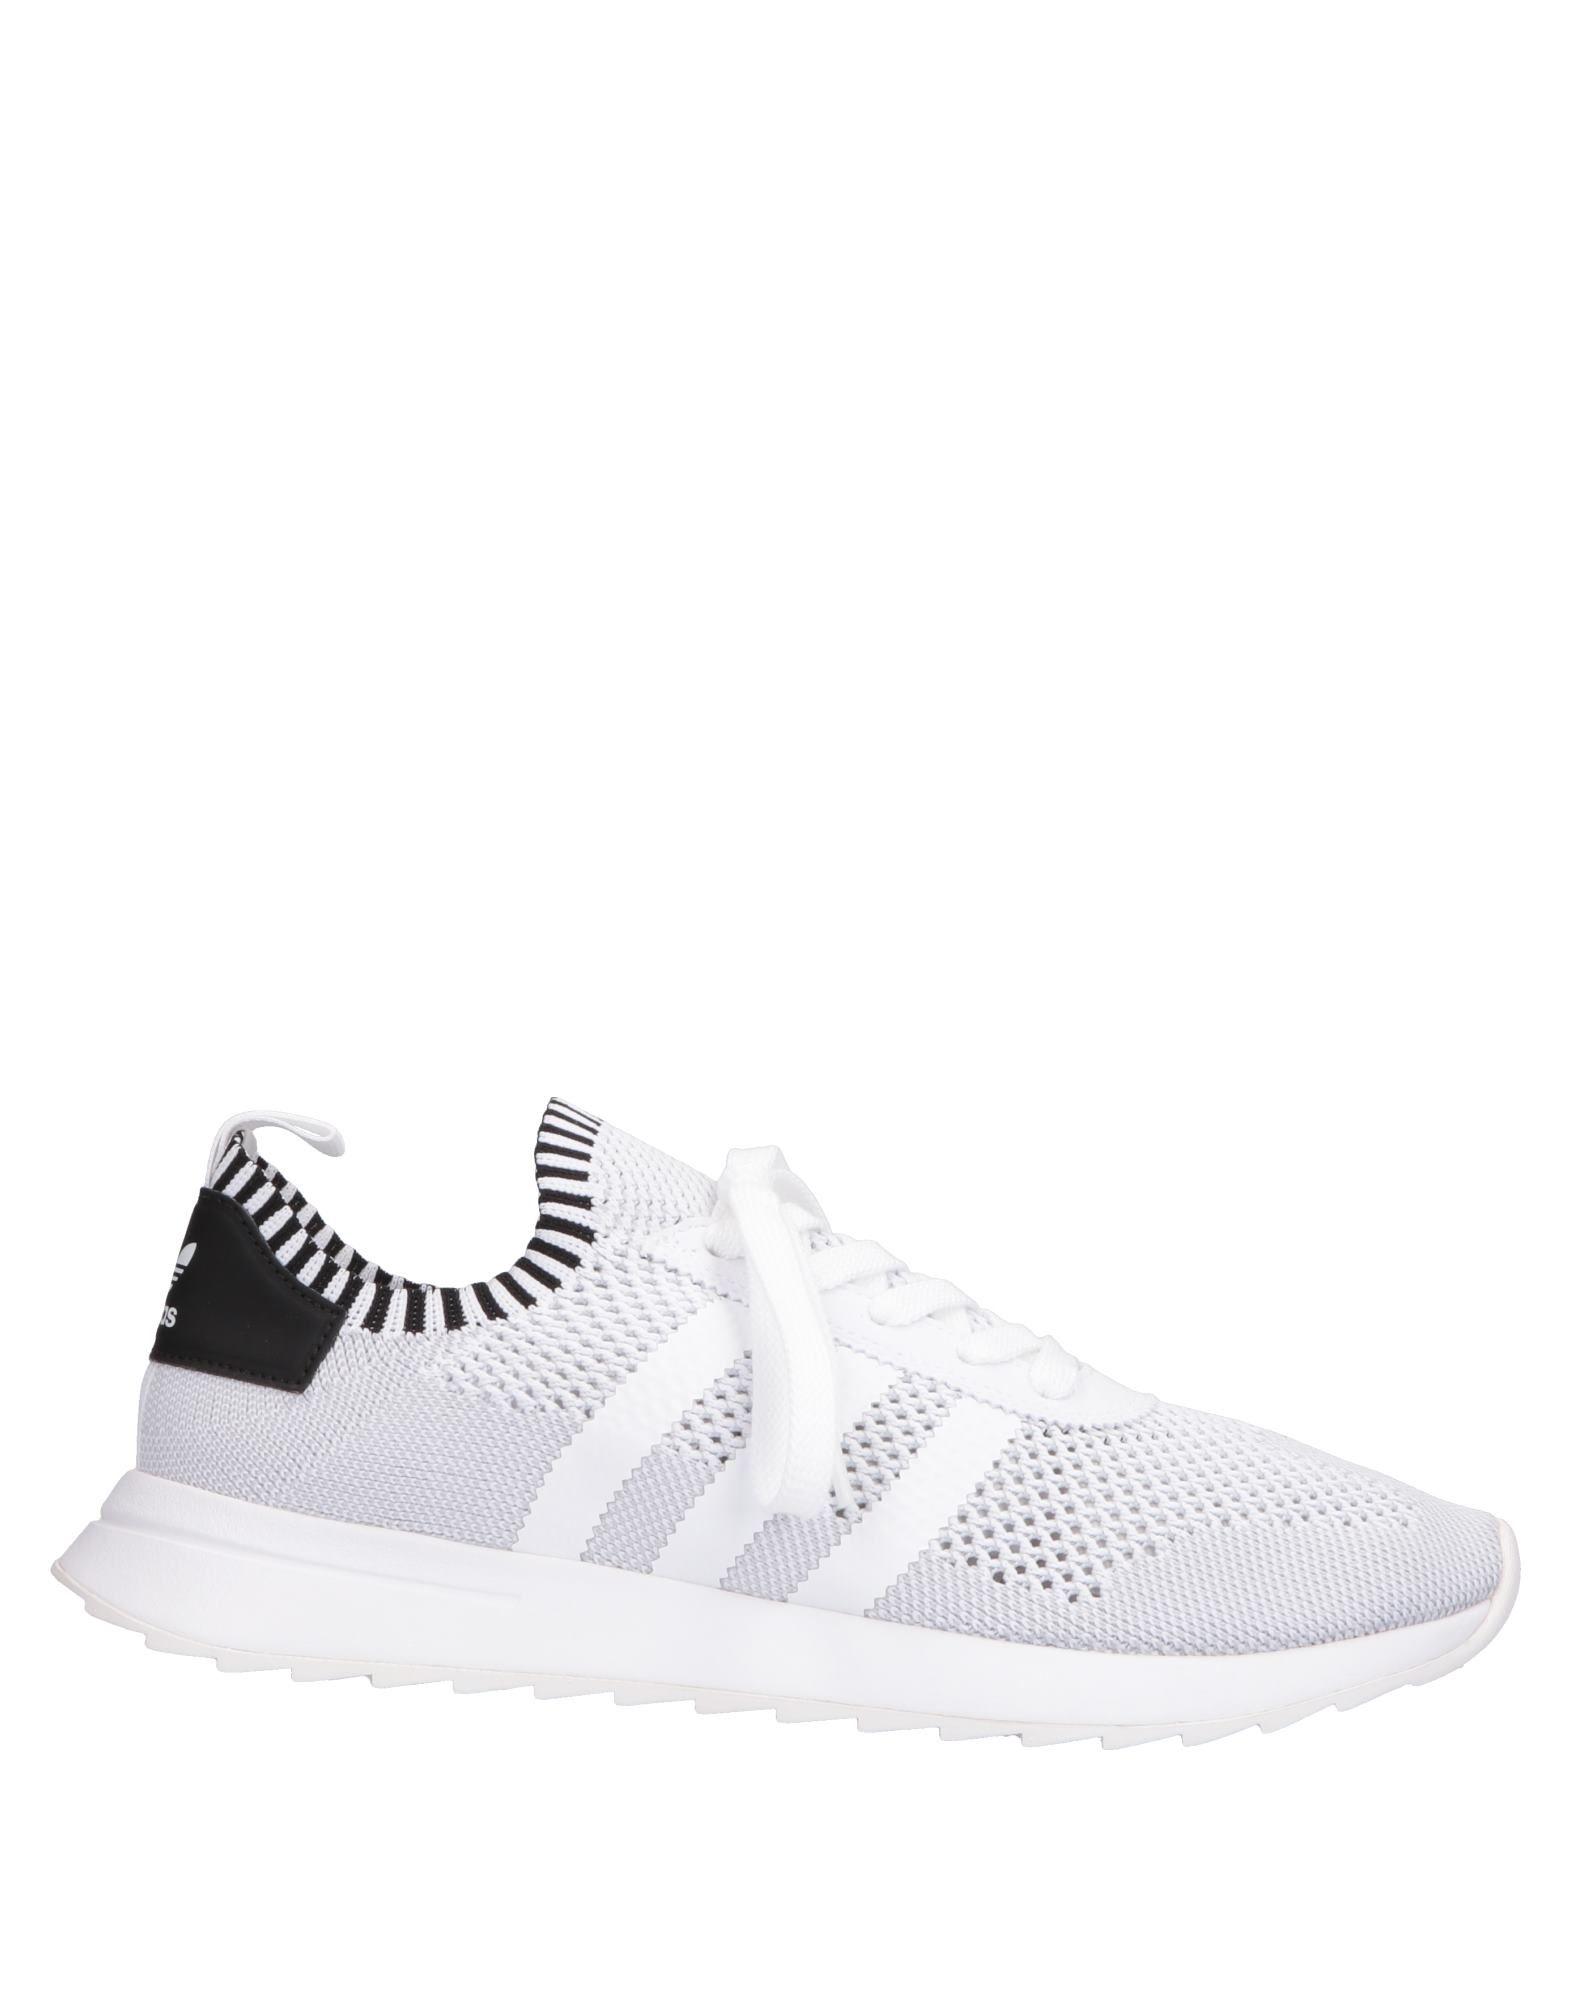 Adidas on Originals Sneakers - Women Adidas Originals Sneakers online on Adidas  Australia - 11561150SJ 354303